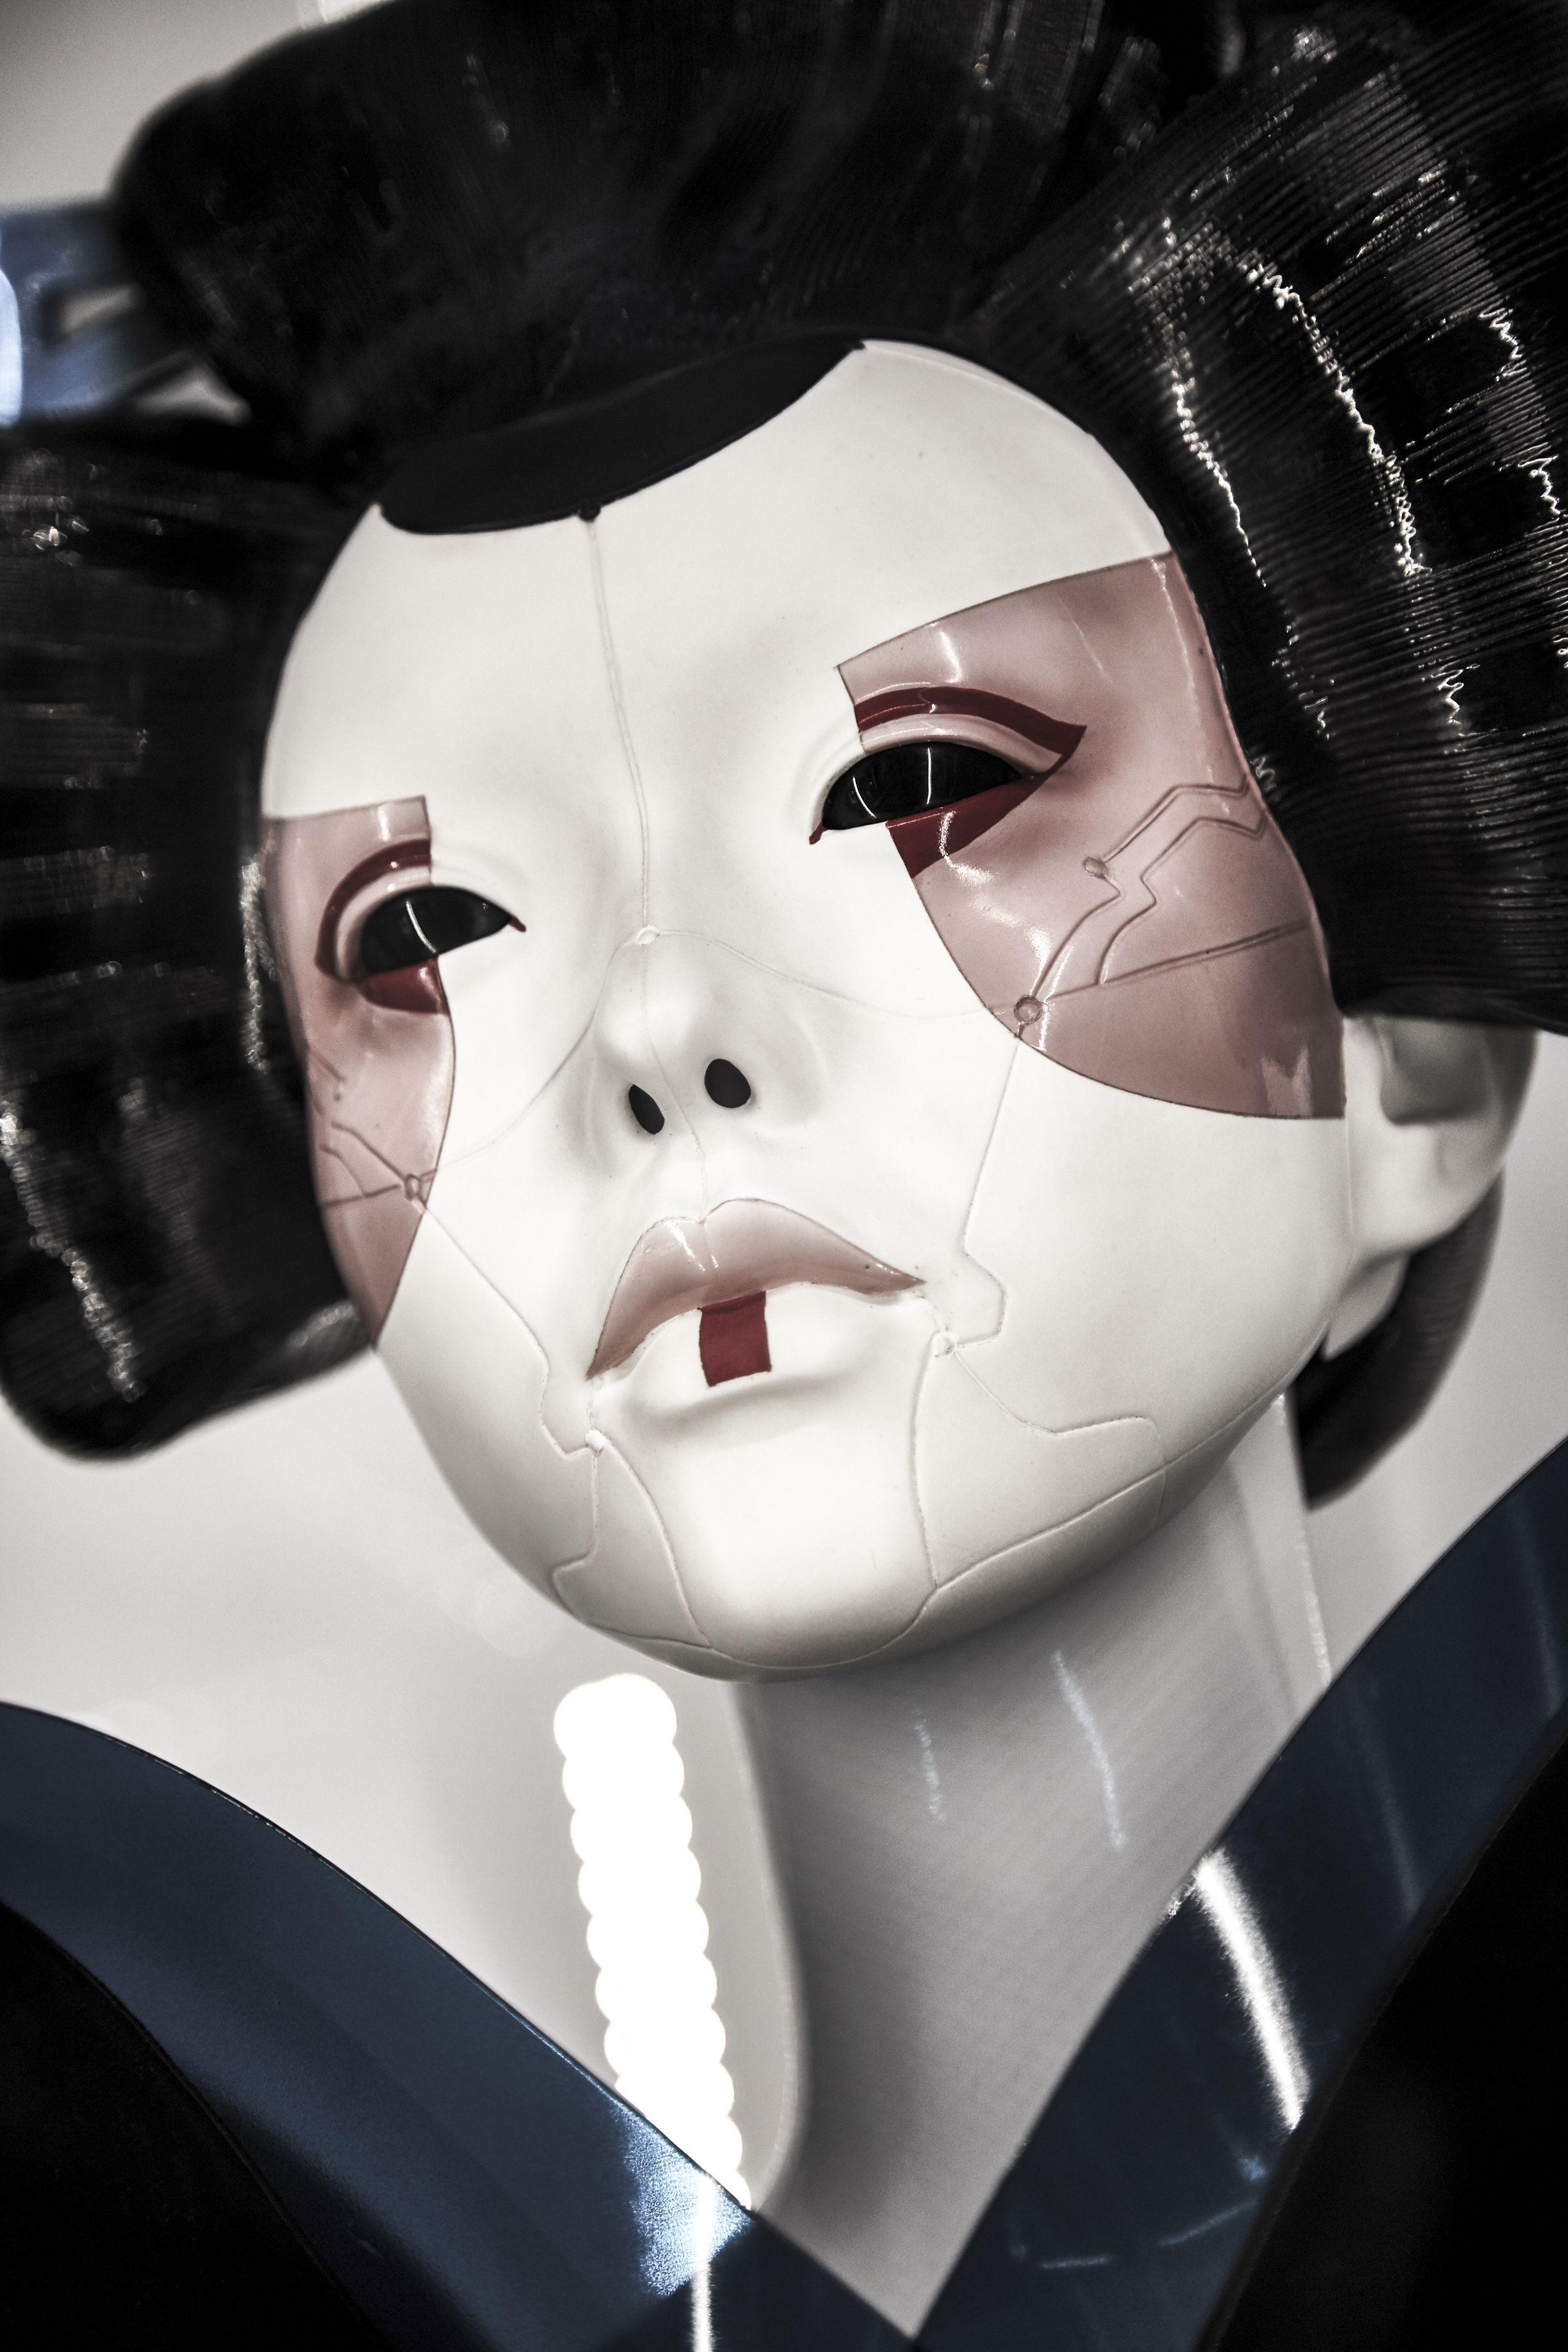 ghost in the shell geisha costume 2400 3600 cyber pinterest geisha costume geisha. Black Bedroom Furniture Sets. Home Design Ideas